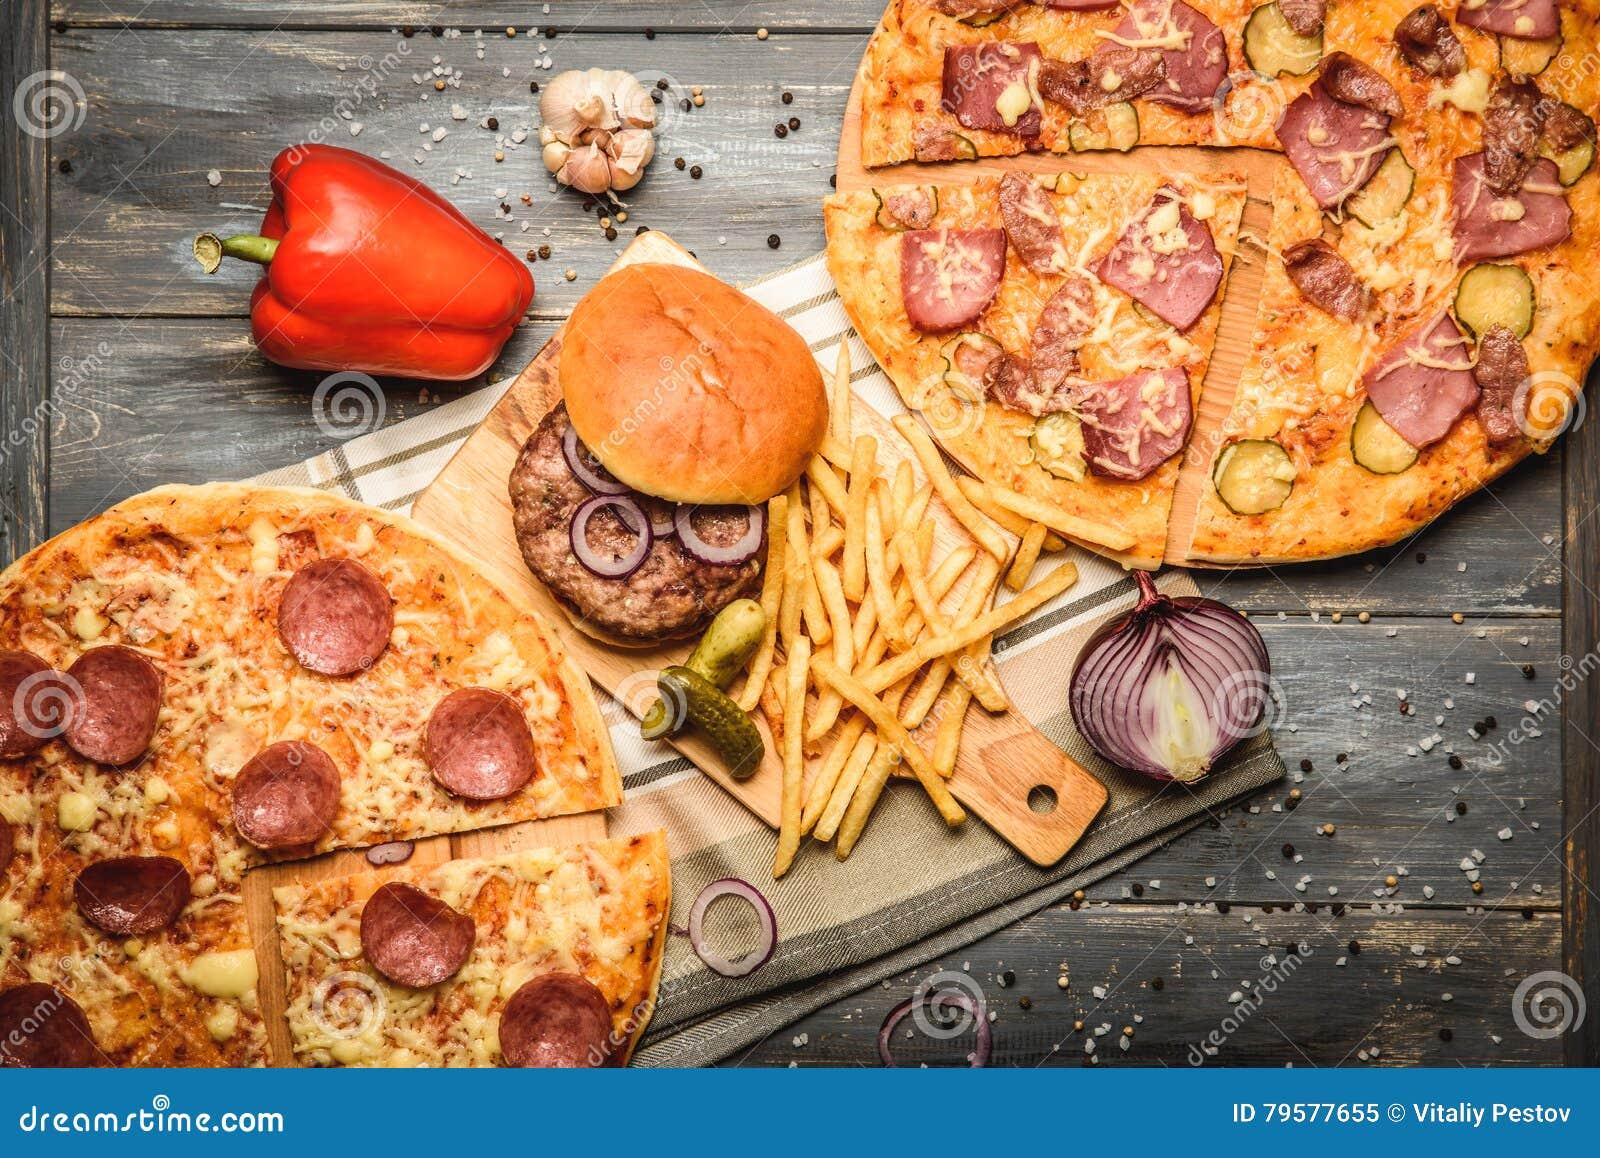 Pizza And Hamburger On Wooden Background Stock Image Image Of Lettuce Fresh 79577655